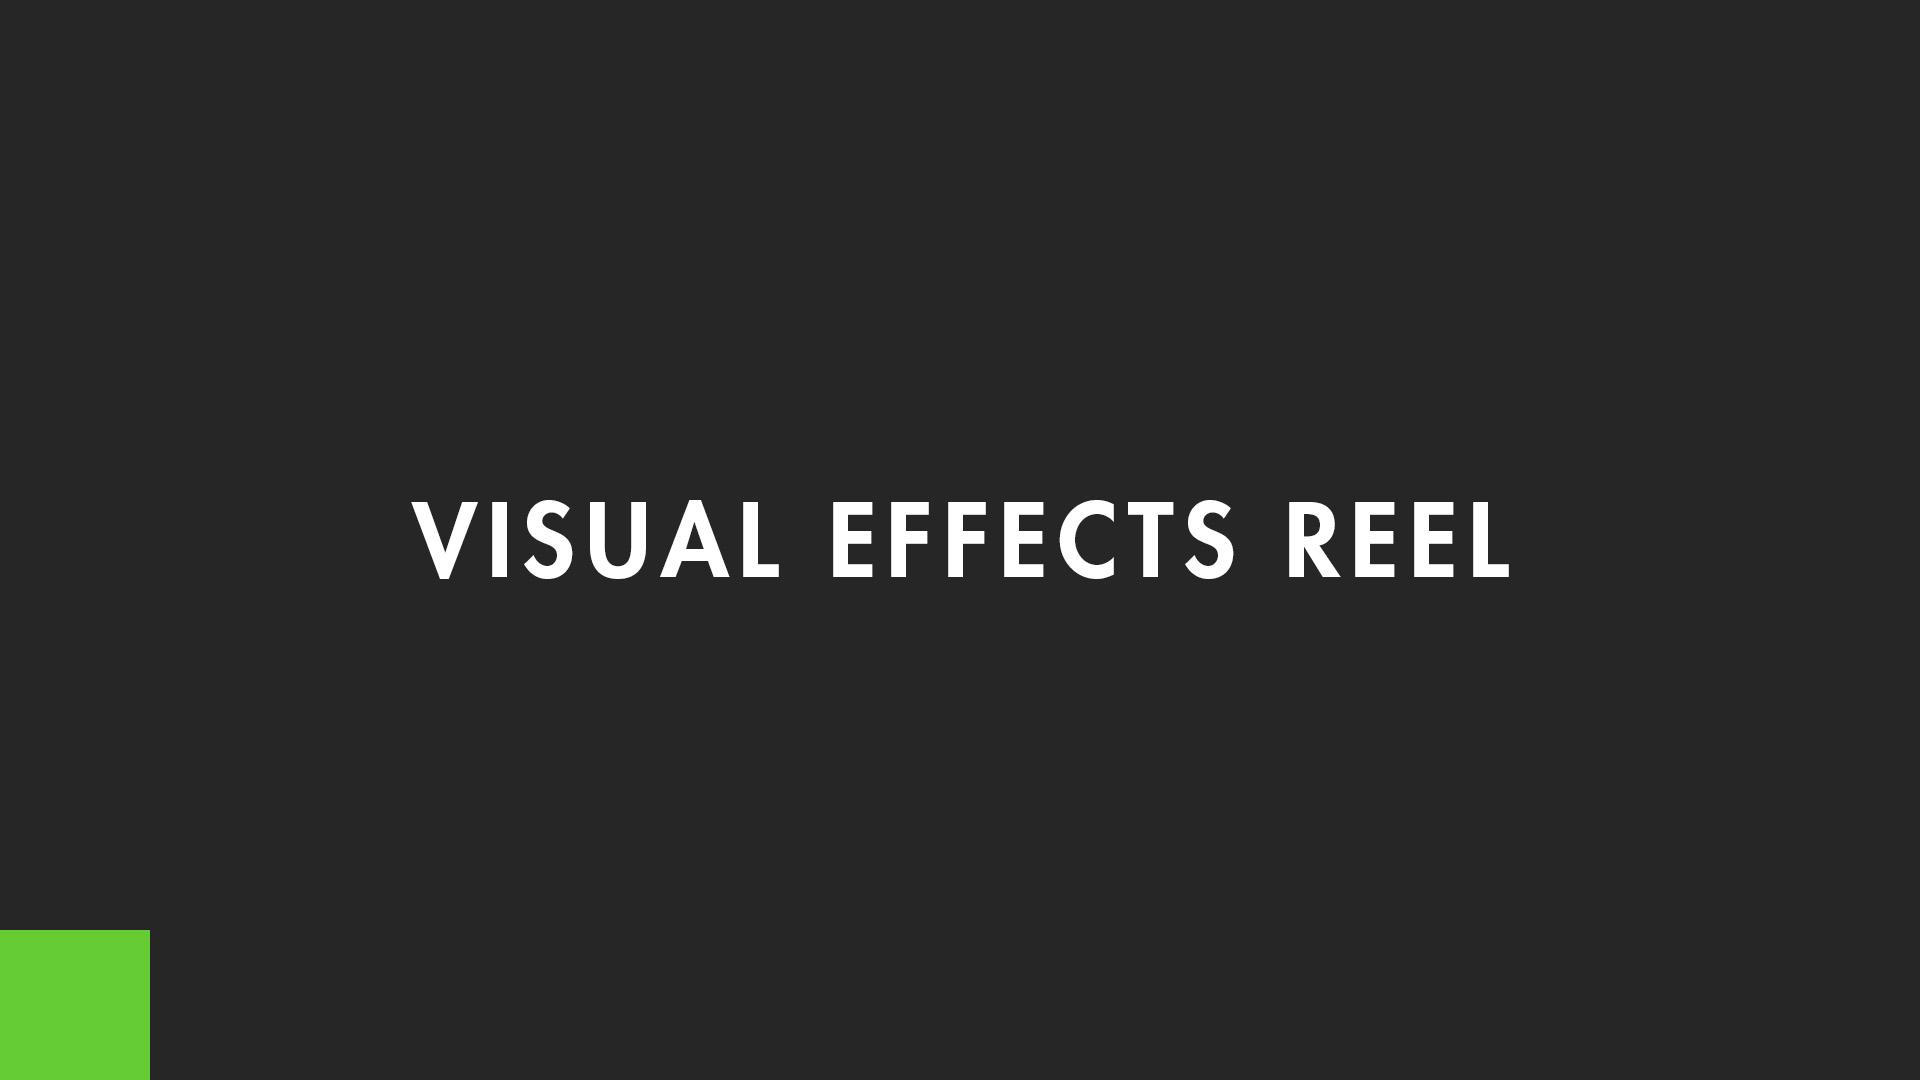 dp-DemoReel_Thumbnail_v001_VisualEffects.jpg